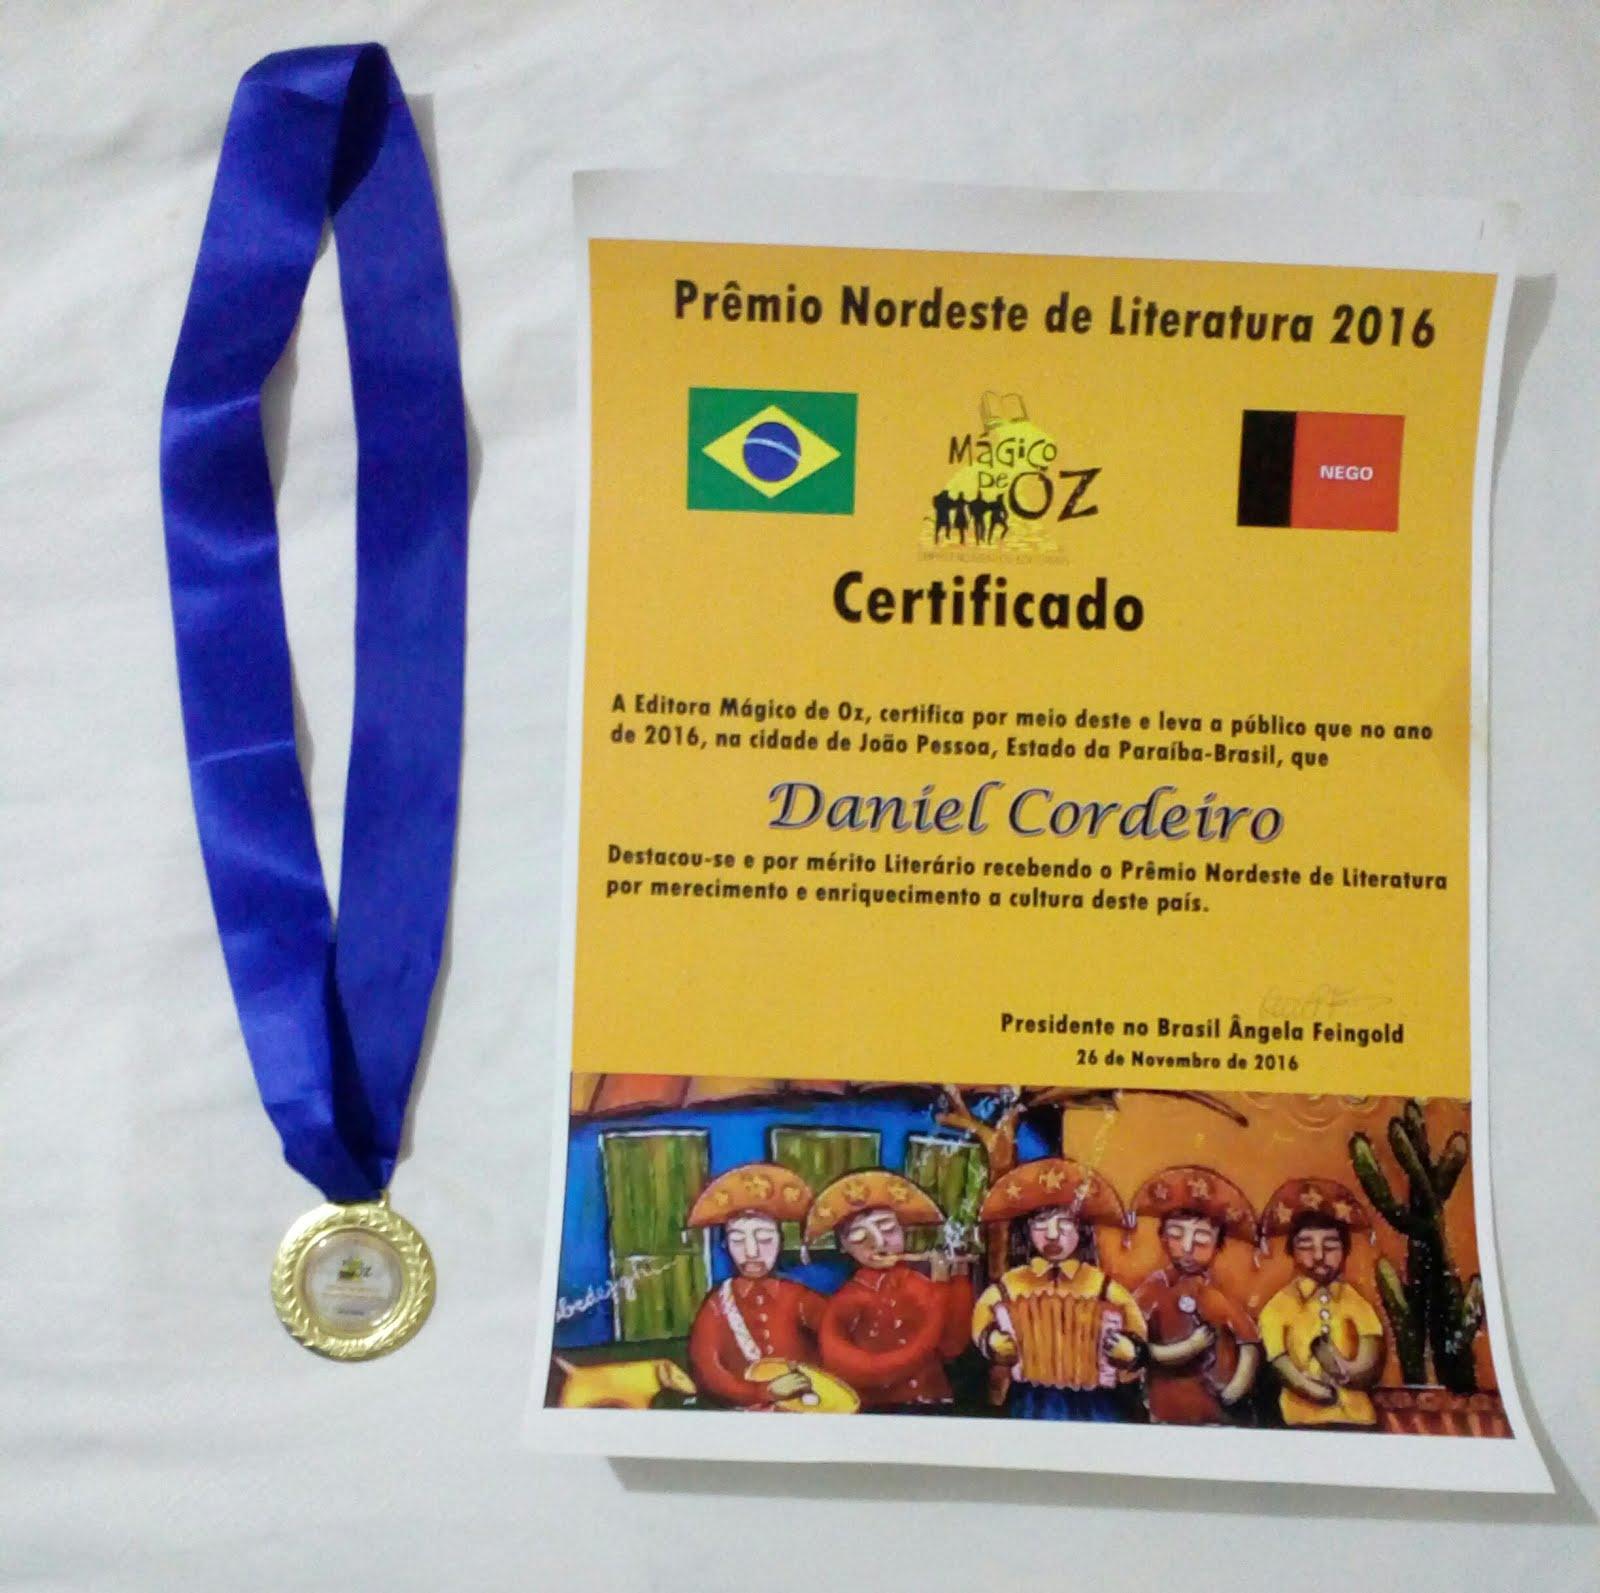 Prémio Nordeste de Literatura 2016